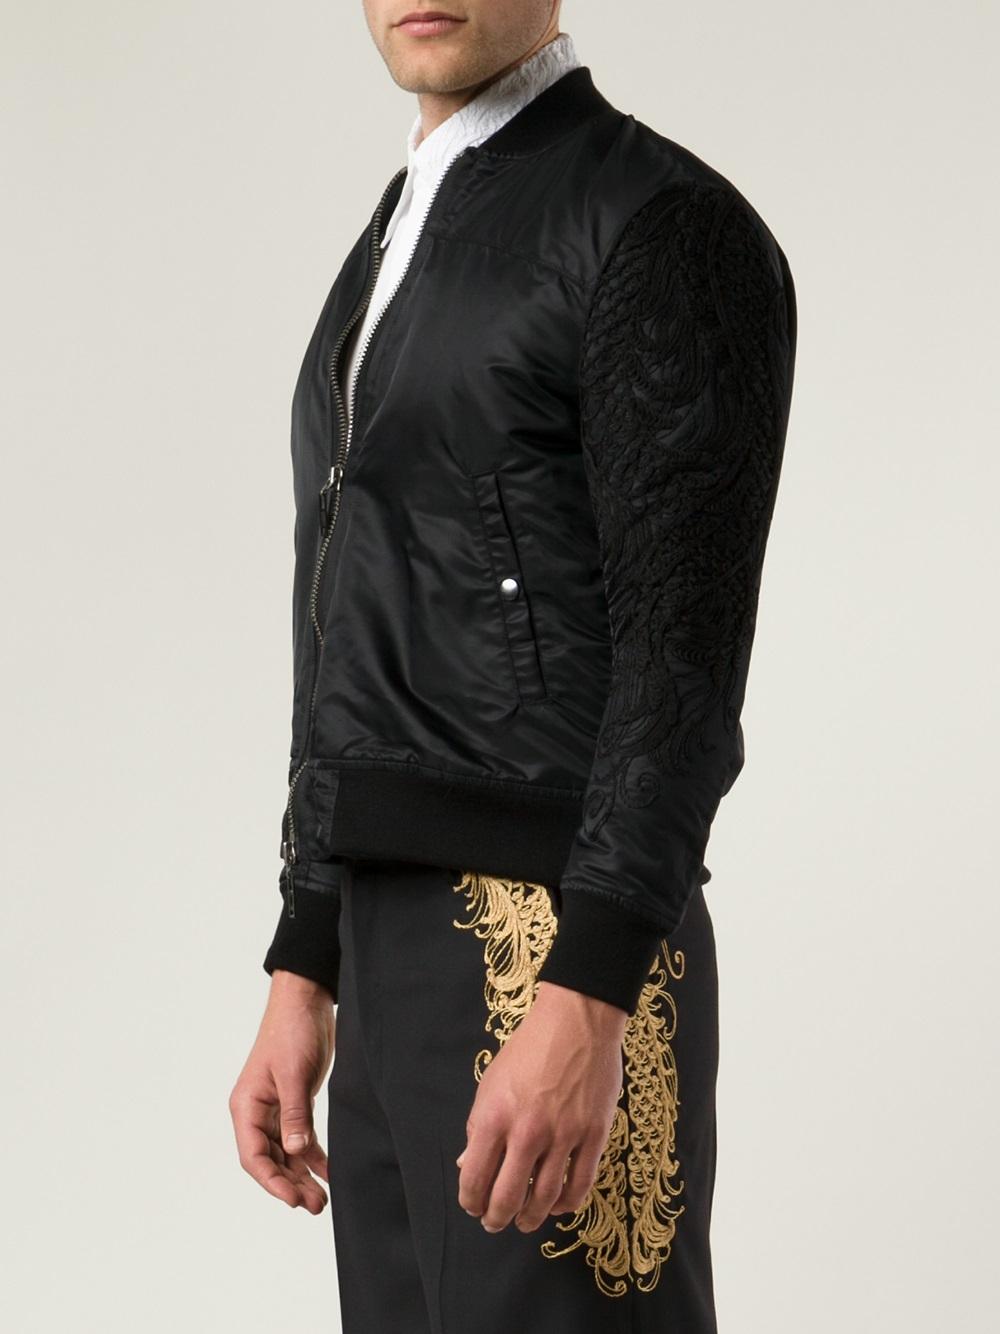 Christian Dada Embroidered Sleeve Jacket in Black for Men